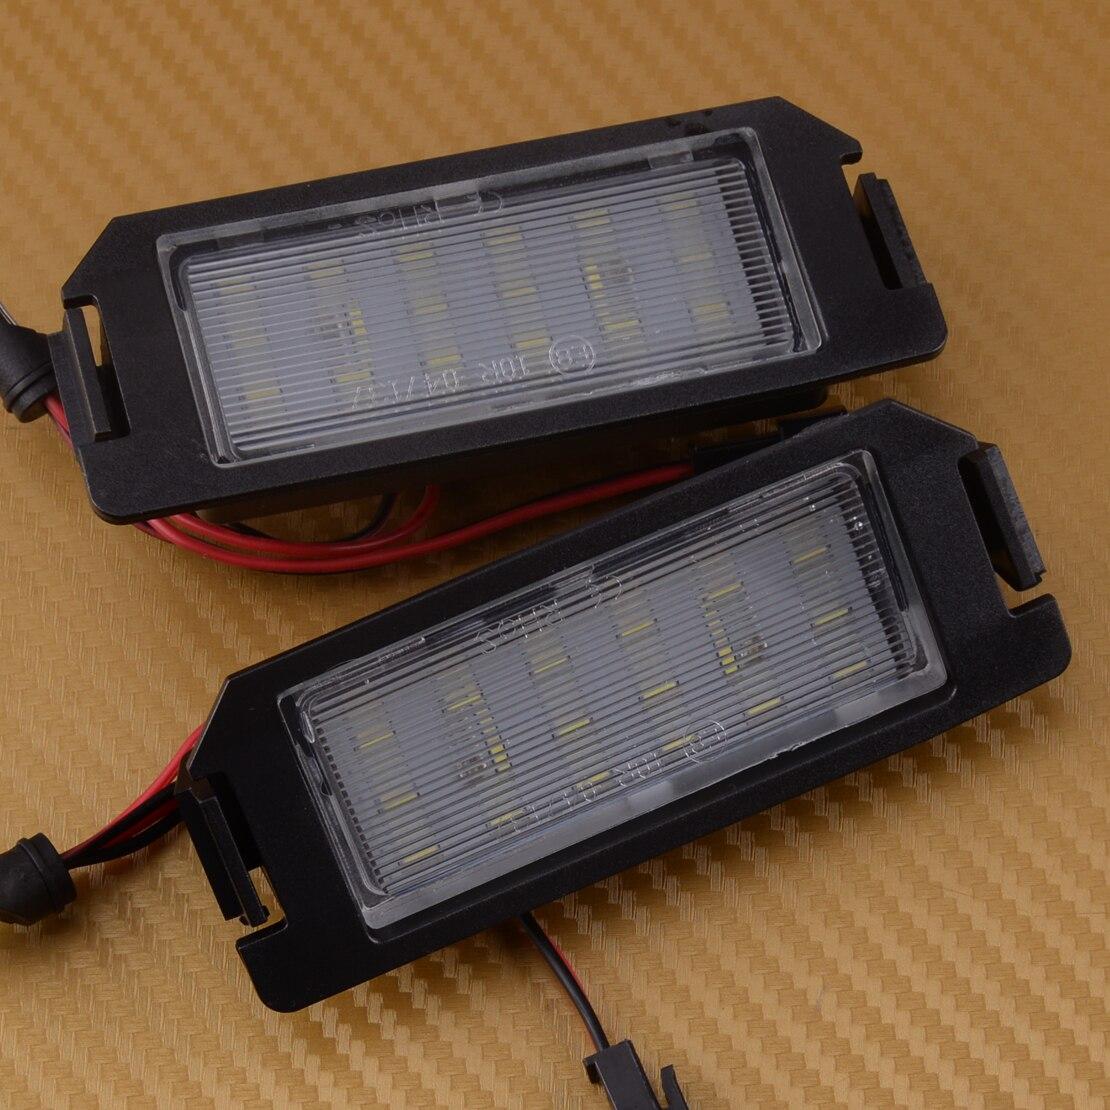 DWCX 2 uds 18 LED para placa de matrícula de la lámpara de la luz para Hyundai I20 HEV FS XG30 Terracan HP Coupe GK